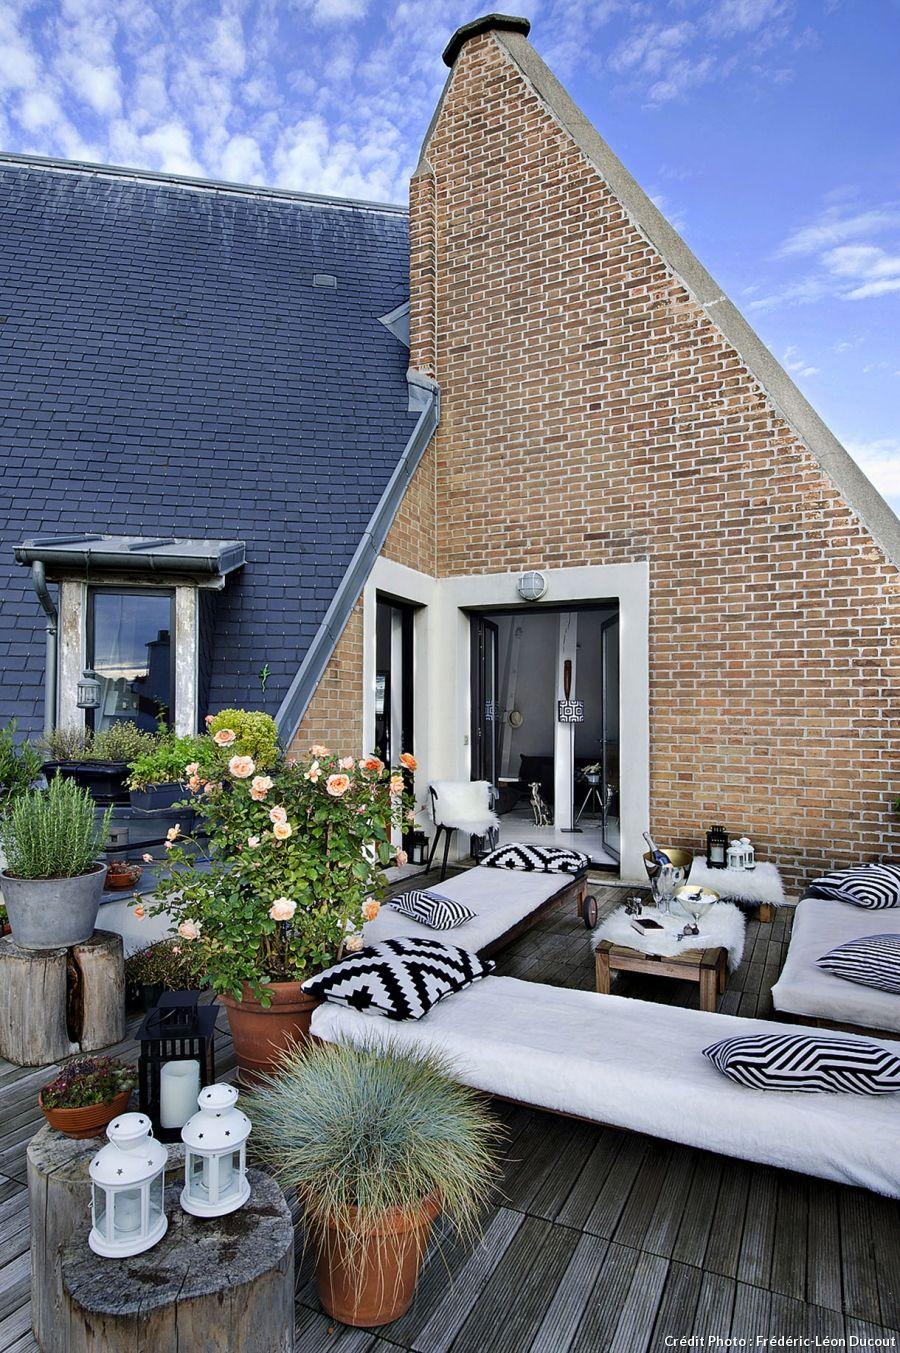 Modern Bioclimatic Duplex Loft With Rooftop Terrace In Paris